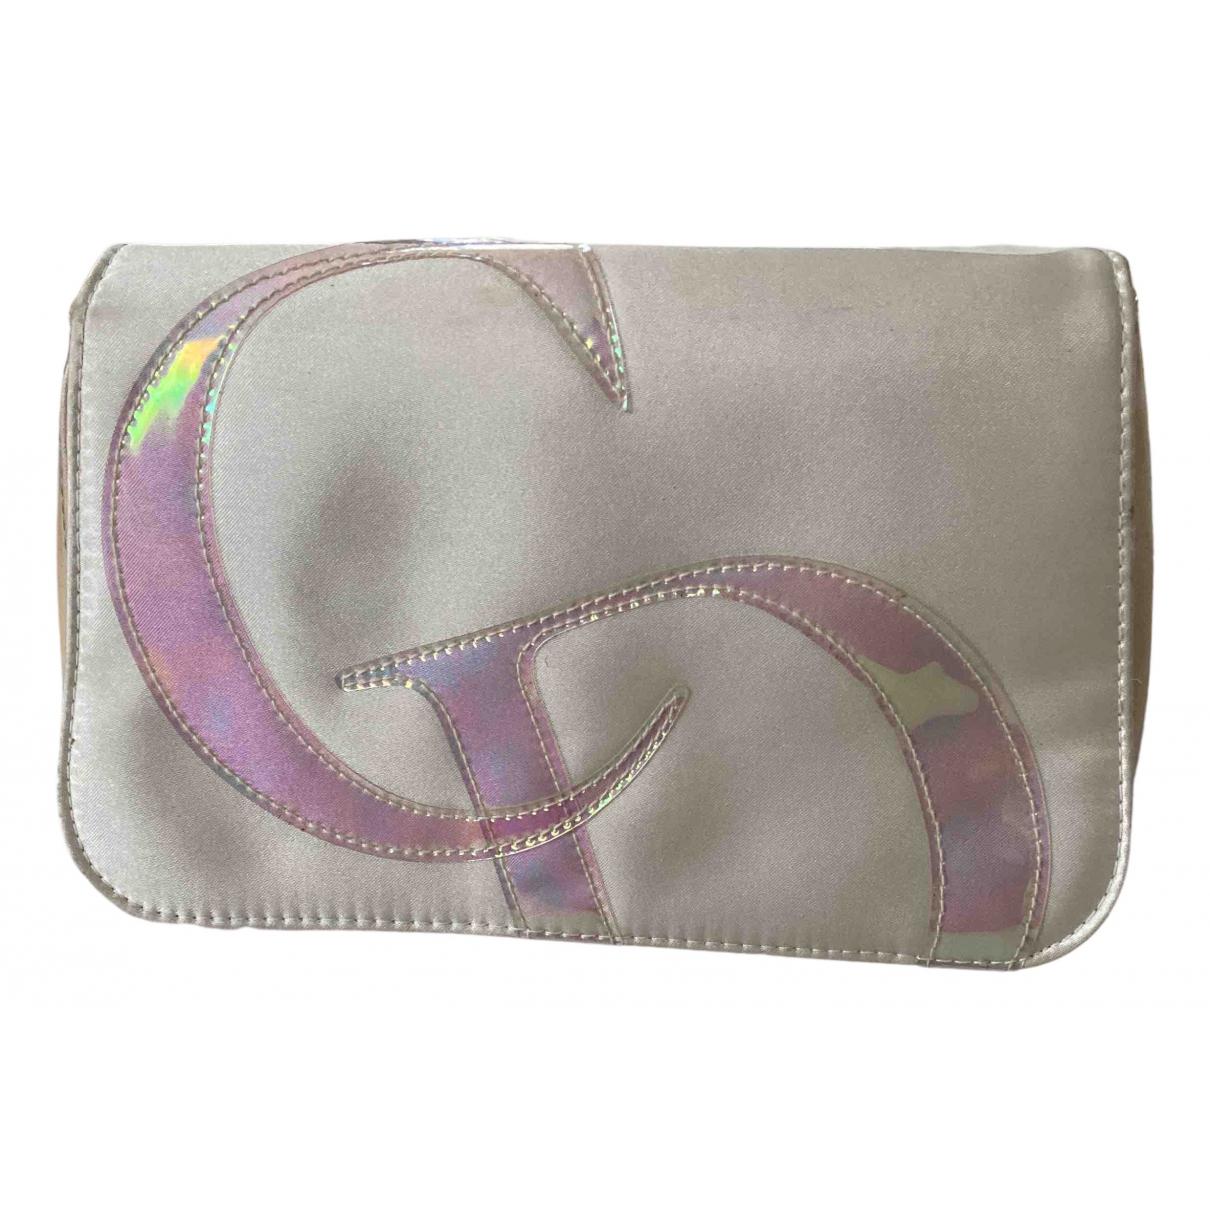 Dior N Ecru Purses, wallet & cases for Women N